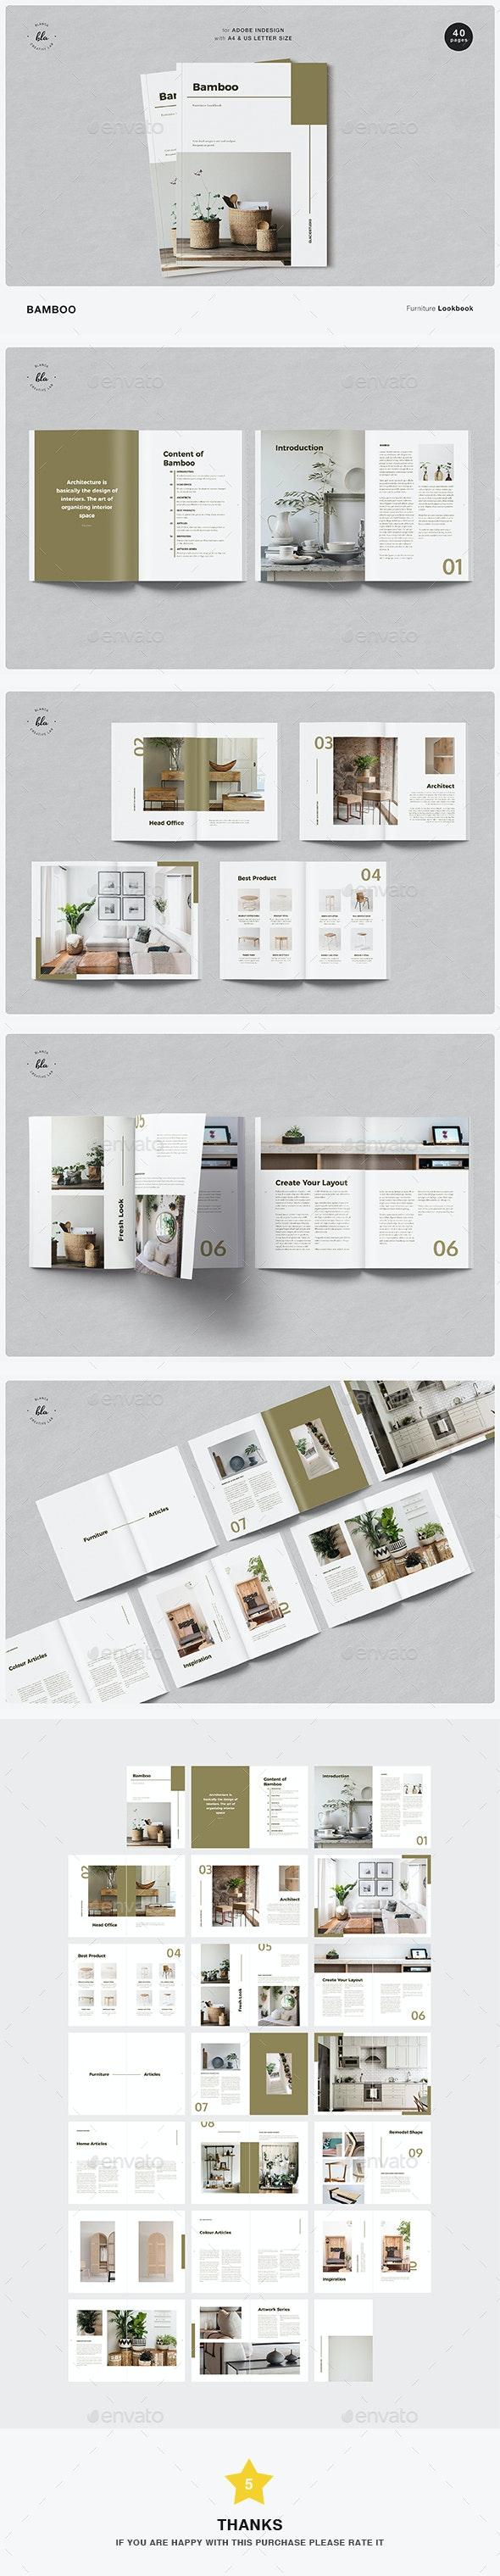 Bamboo Furniture Lookbook - Magazines Print Templates